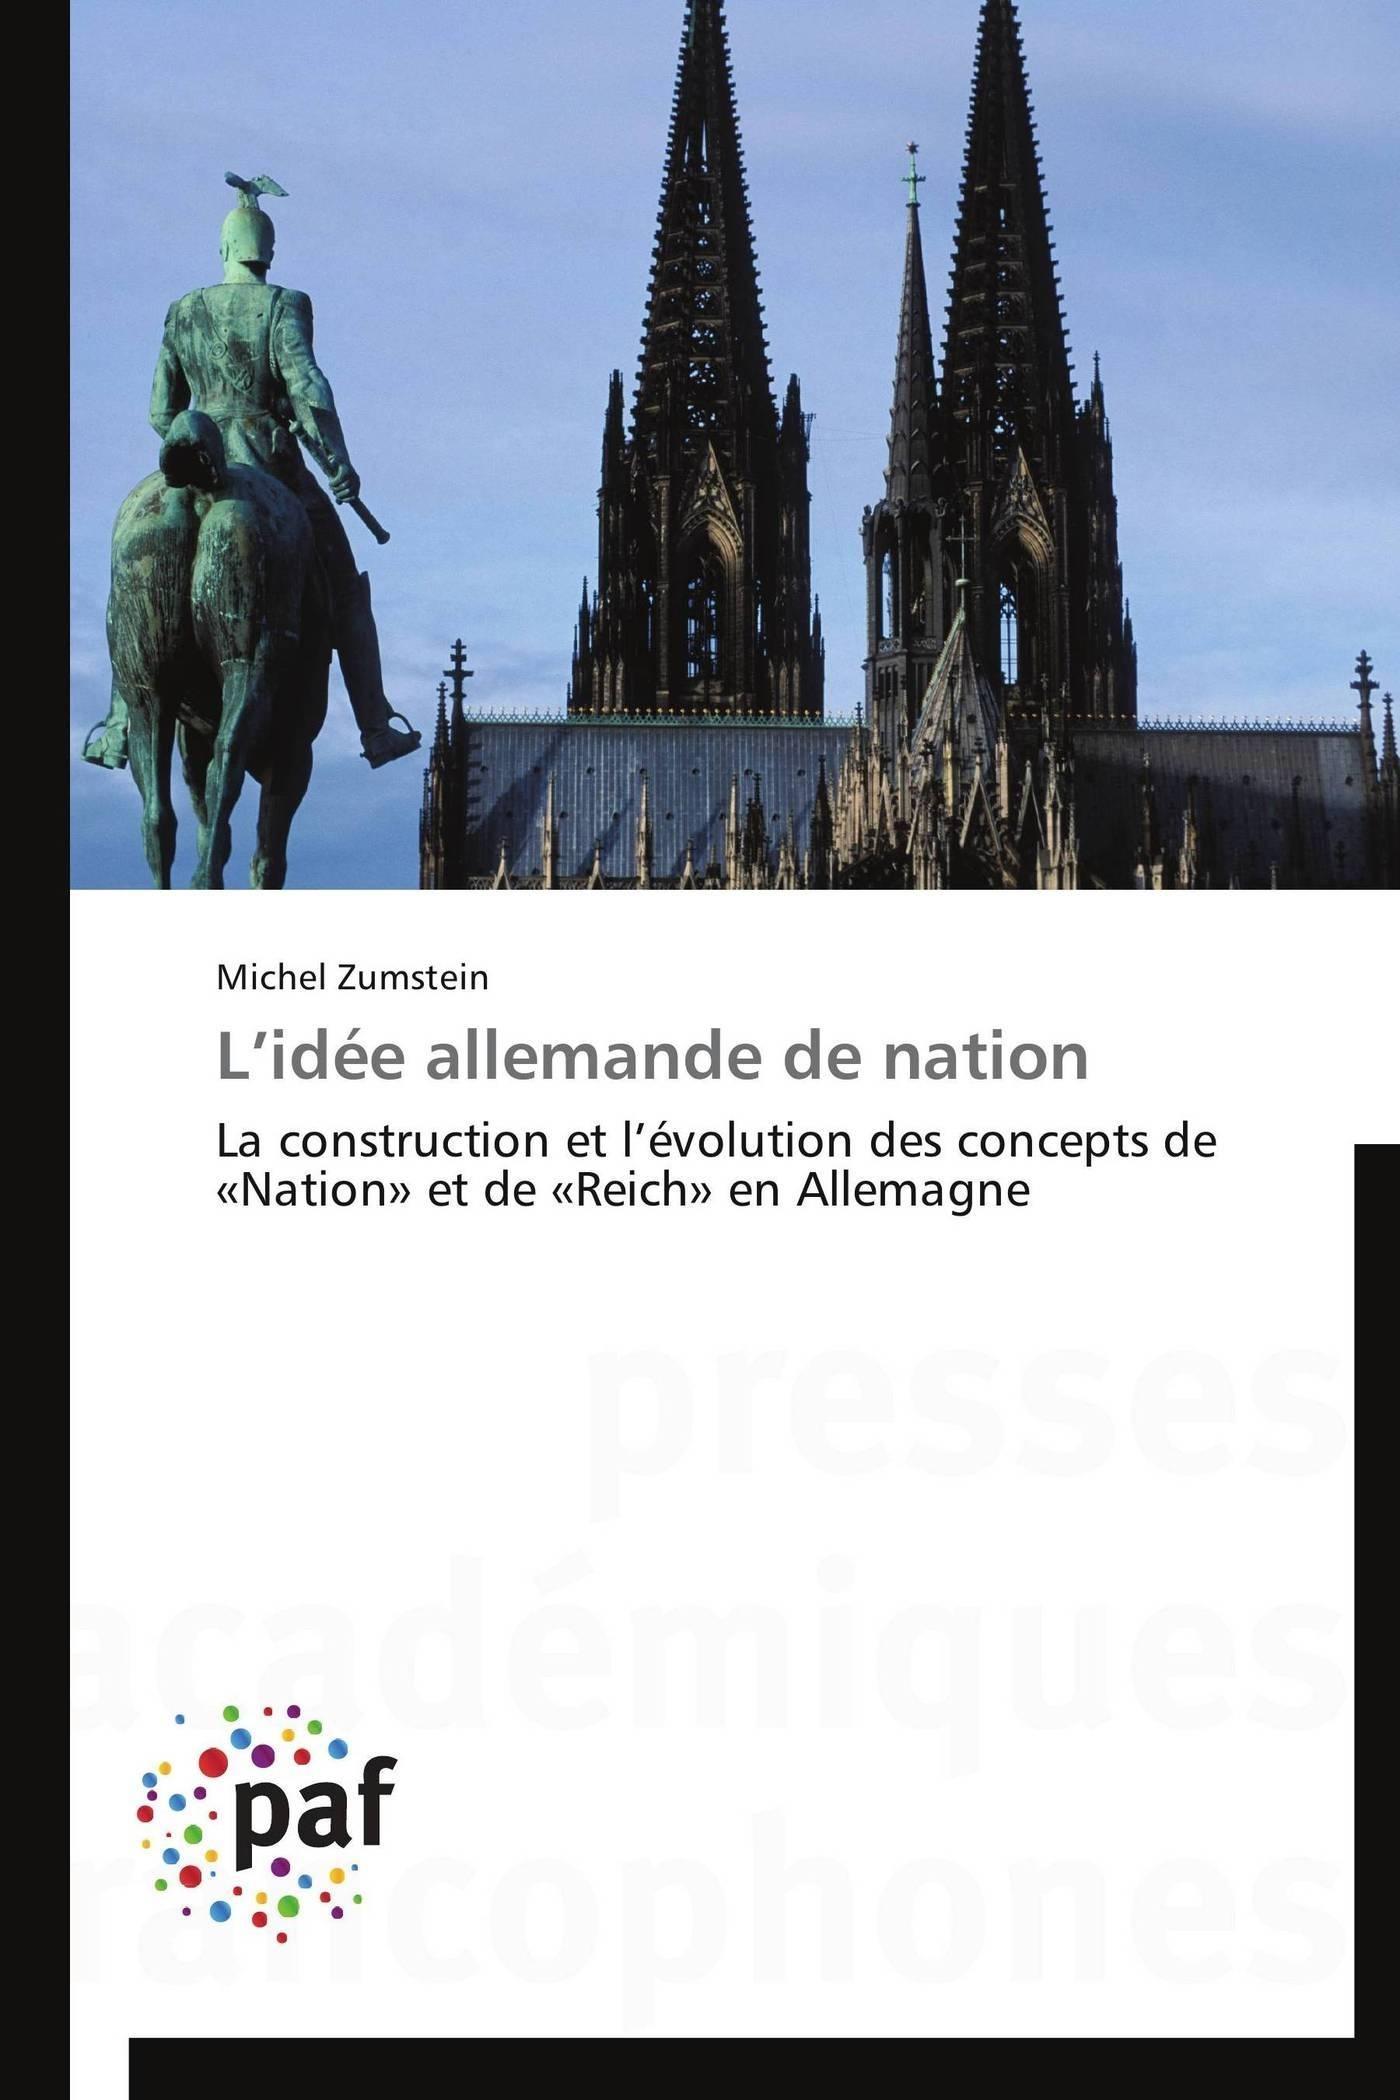 L IDEE ALLEMANDE DE NATION